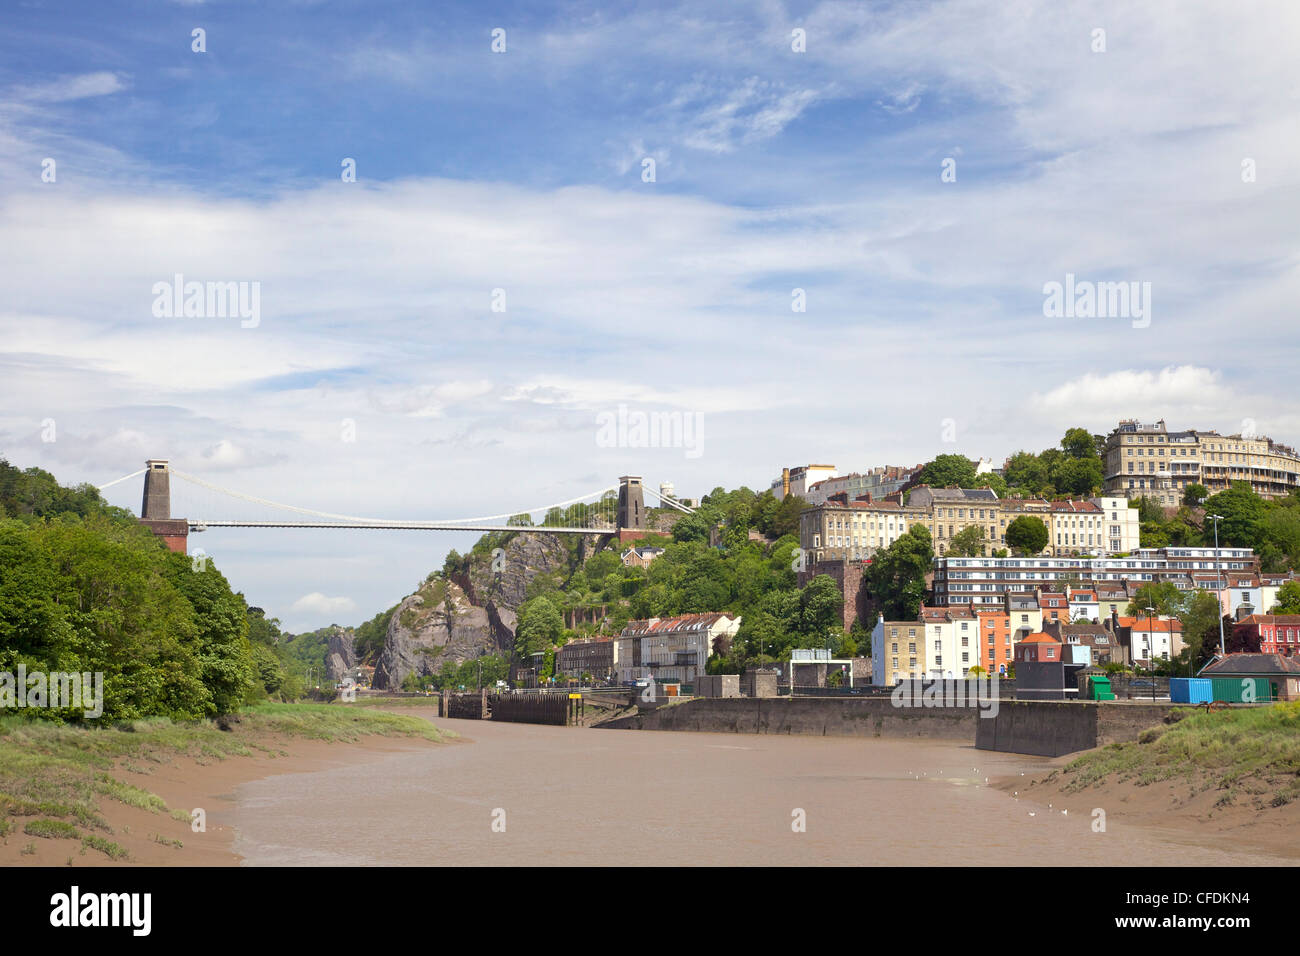 Clifton Suspension Bridgel, spanning the Avon Gorge of the River Avon, Clifton, Bristol, England, UK - Stock Image